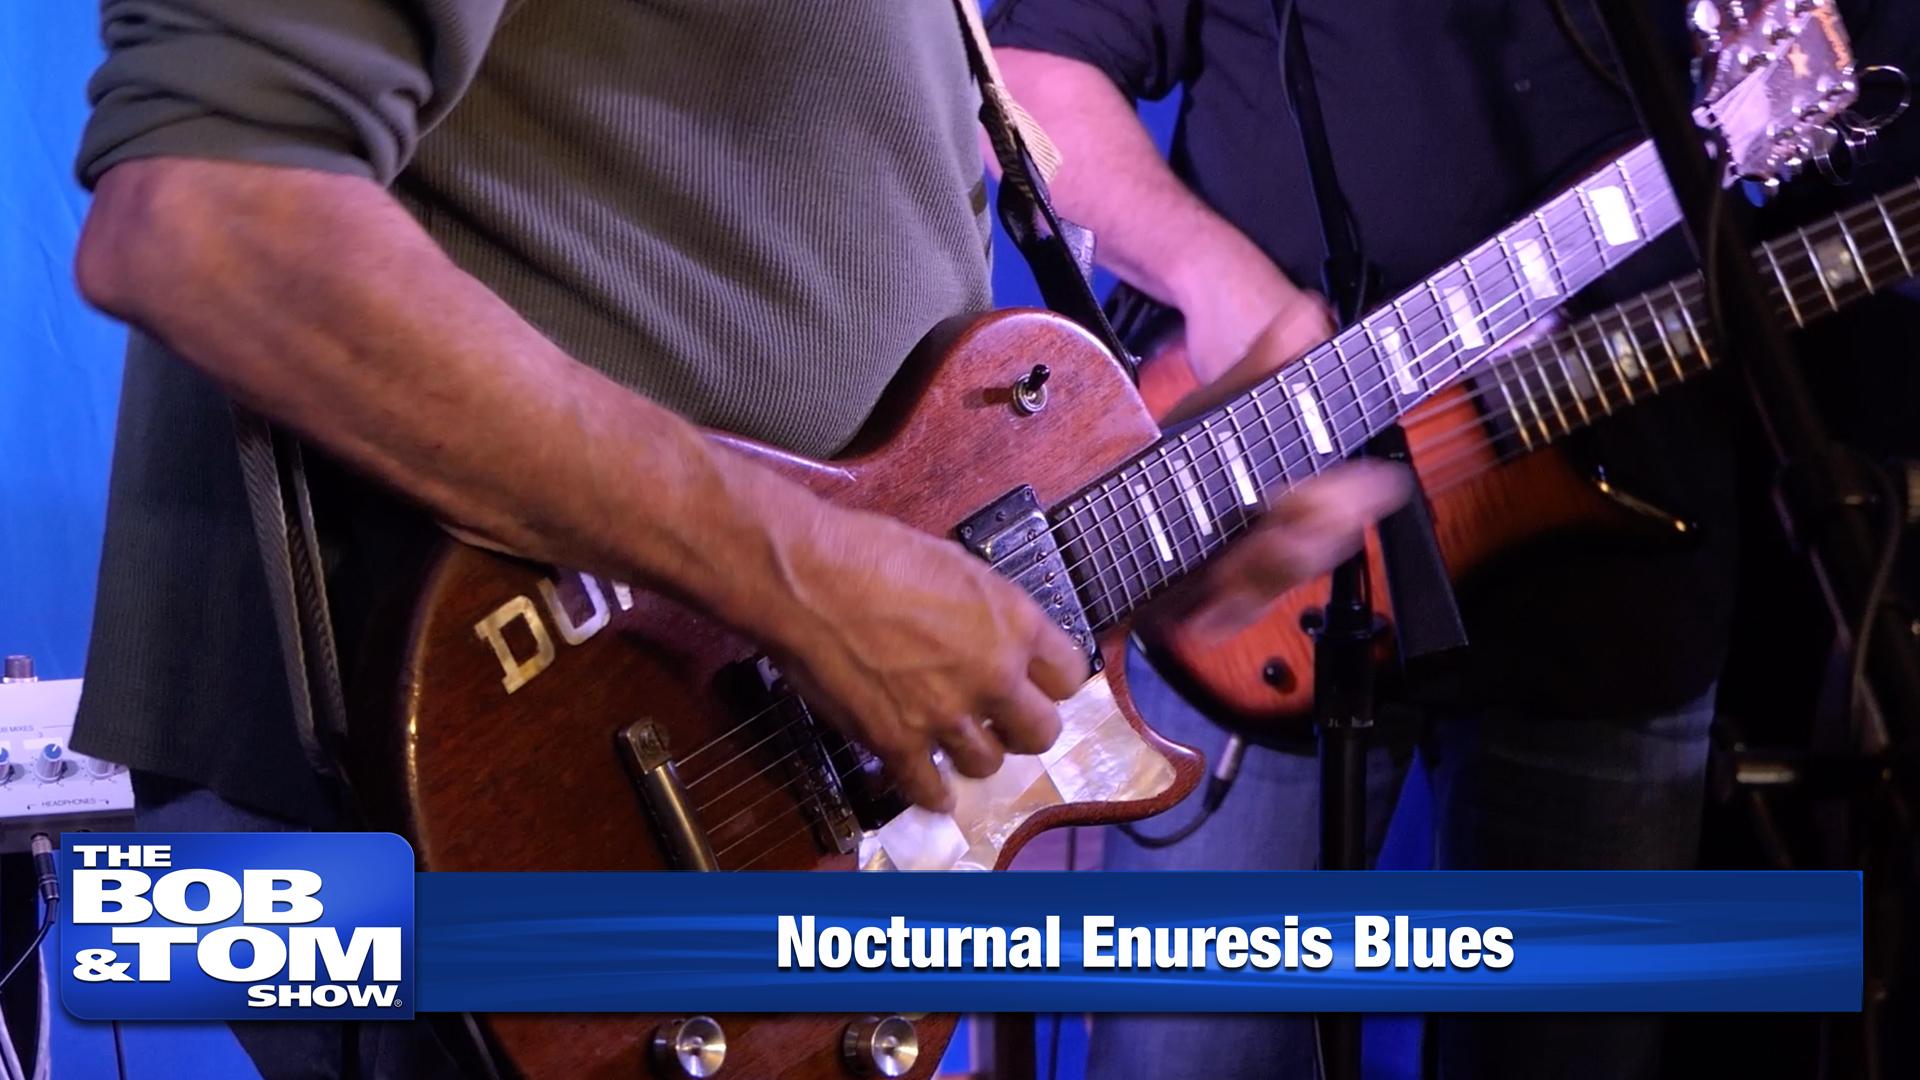 Nocturnal Enuresis Blues with Pat Godwin